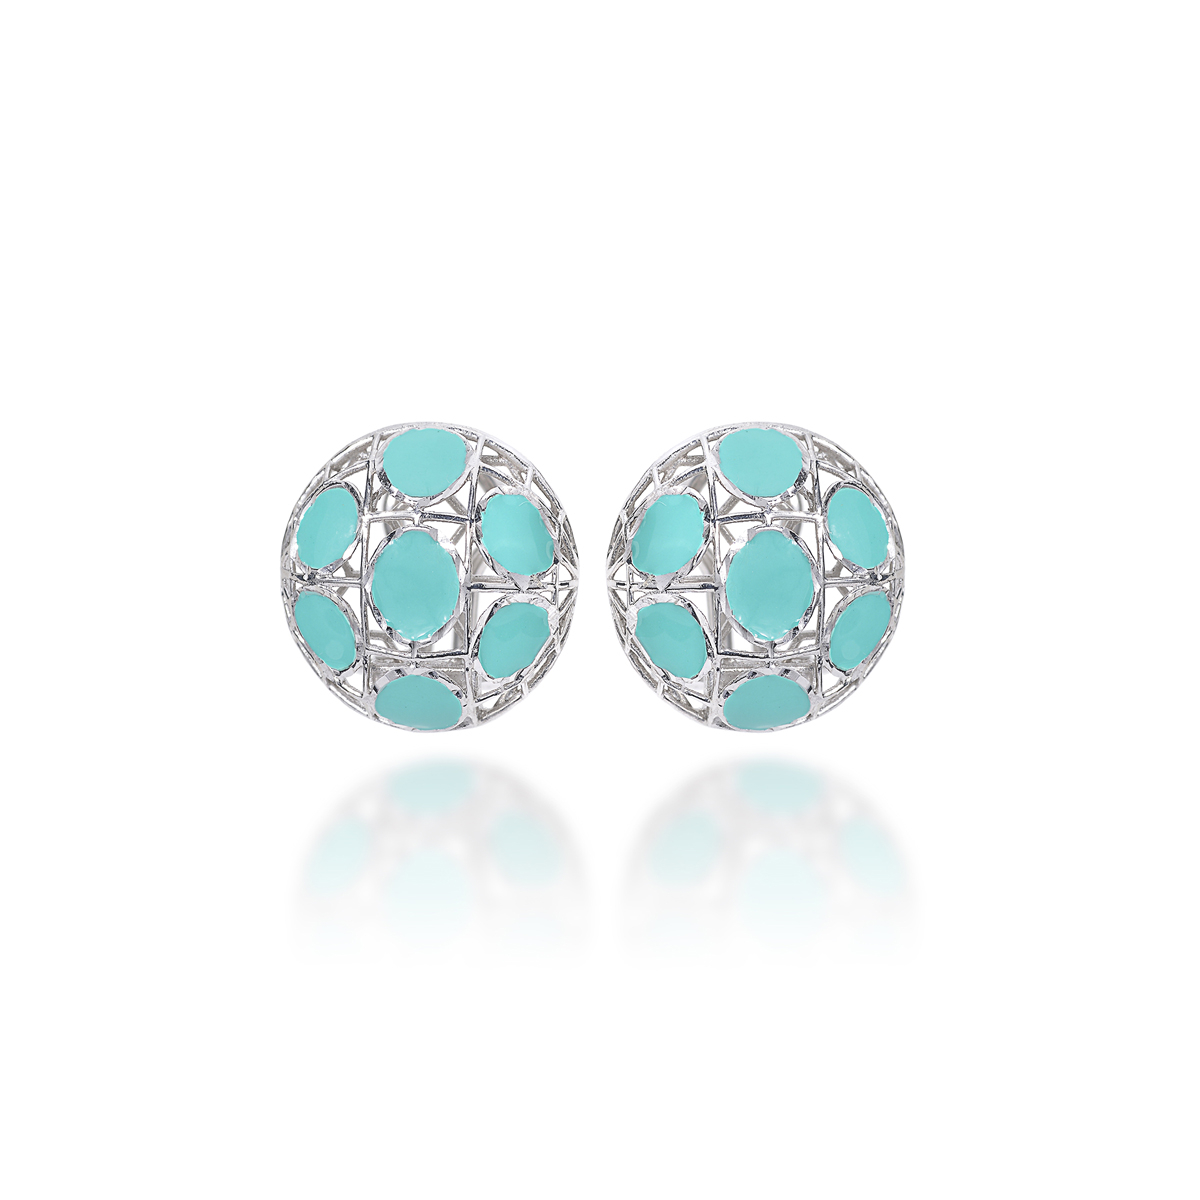 Rhodium-Plated Silver Earrings Turquoise Enamel